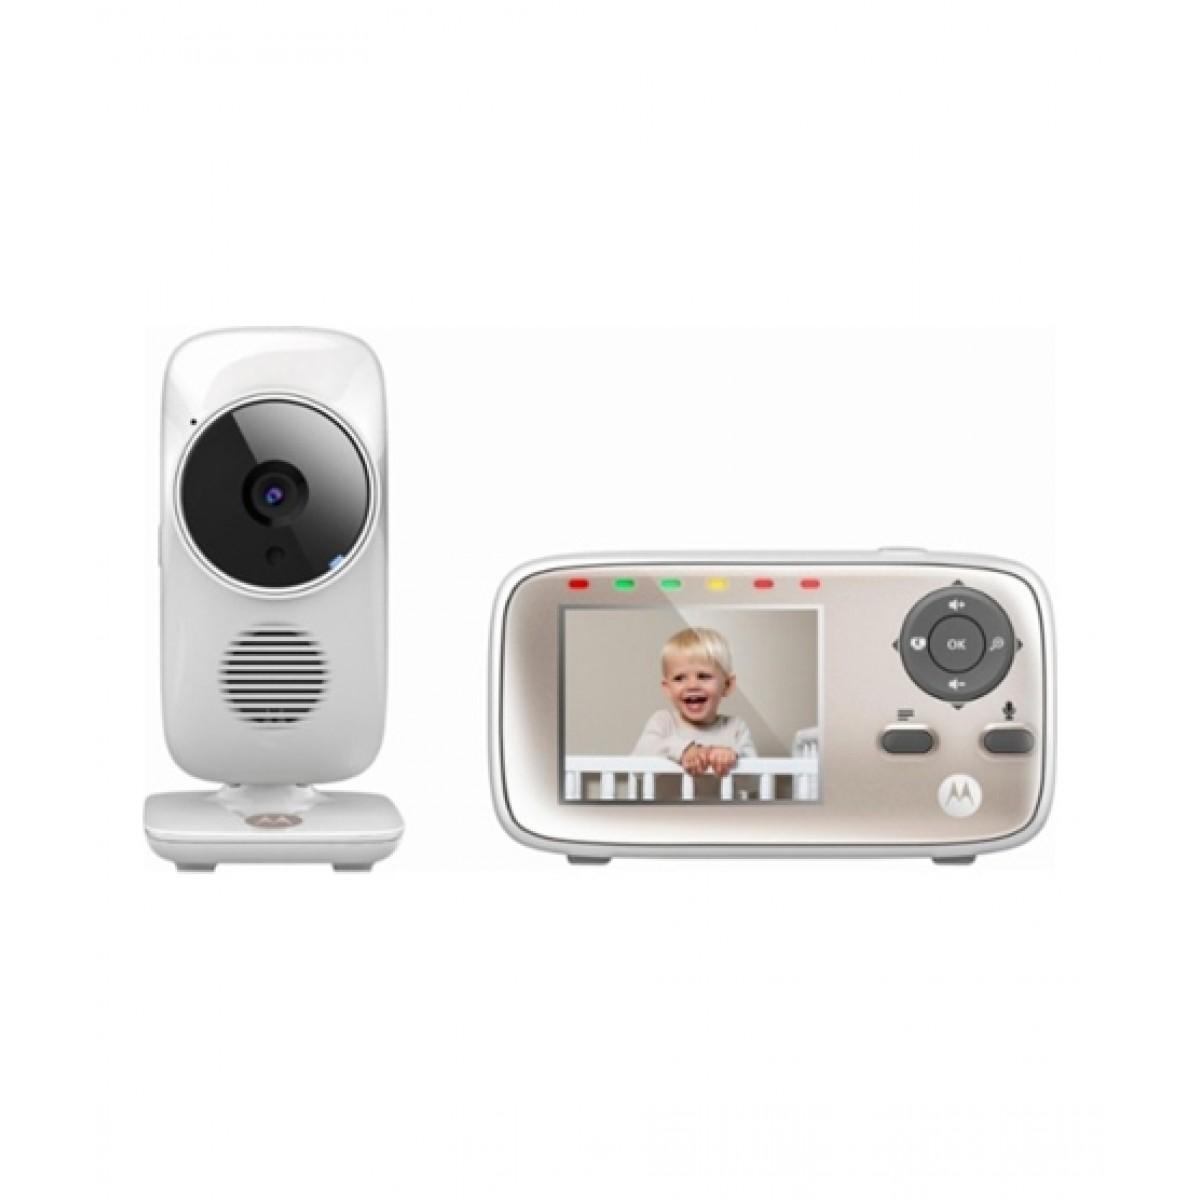 Motorola Baby Wi-Fi Video Monitor White (MBP667CONNECT)